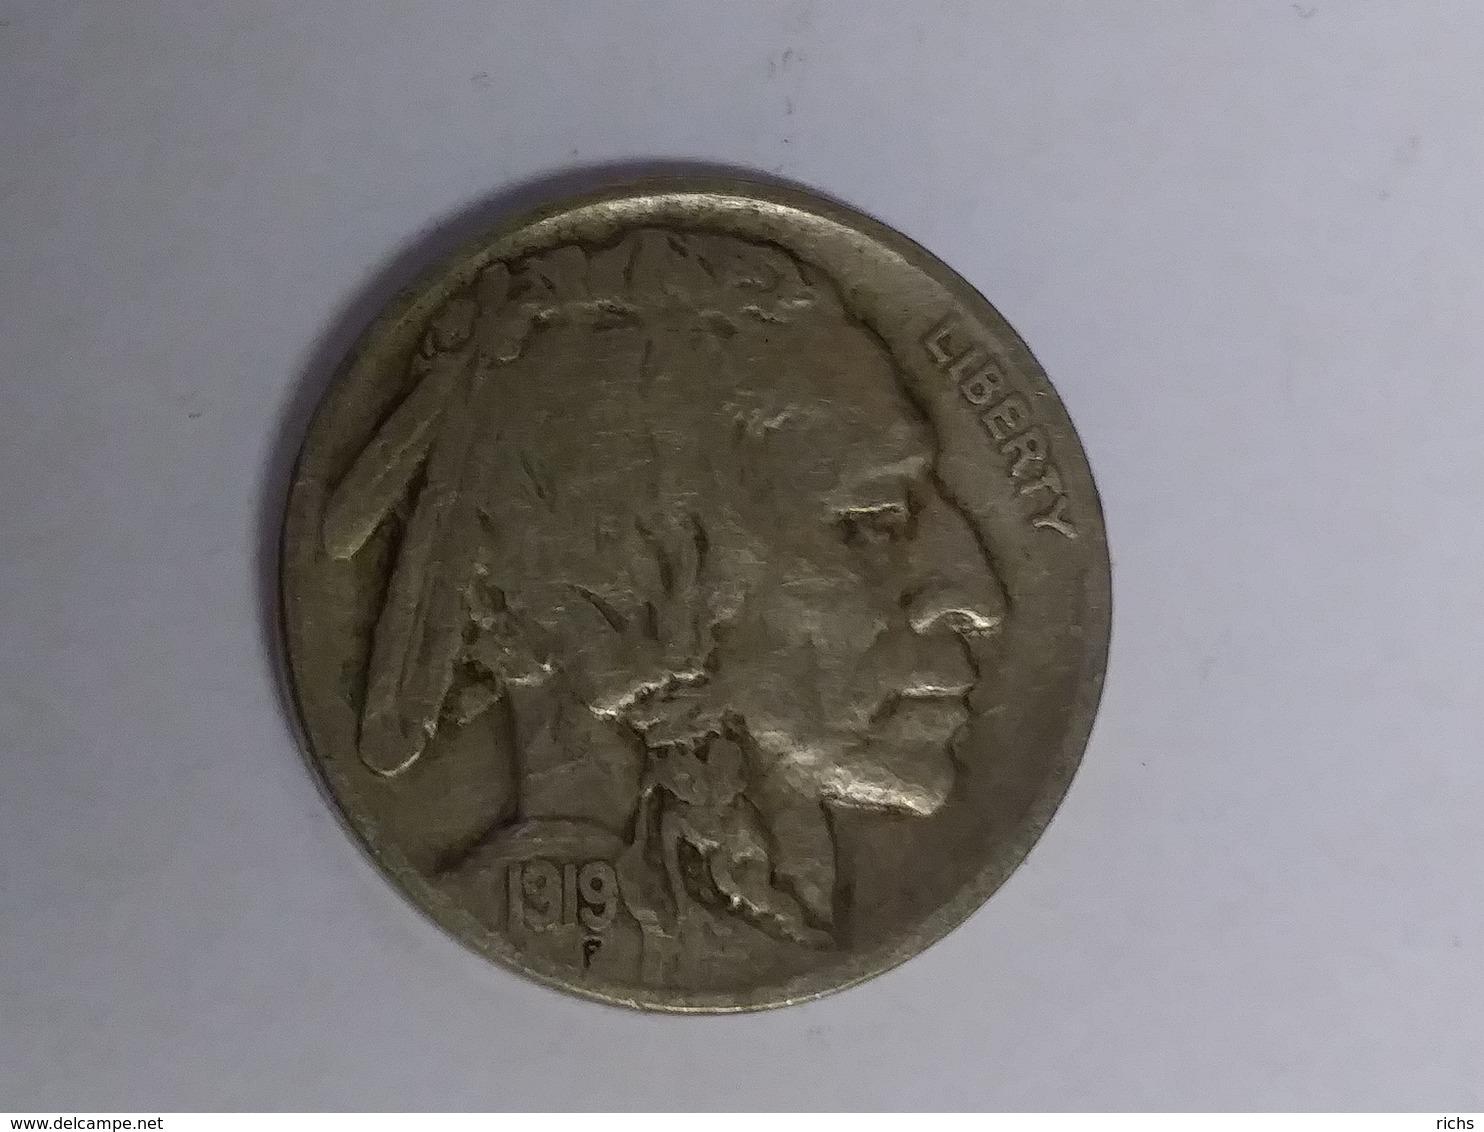 1919 Buffalo Nickel - Émissions Fédérales